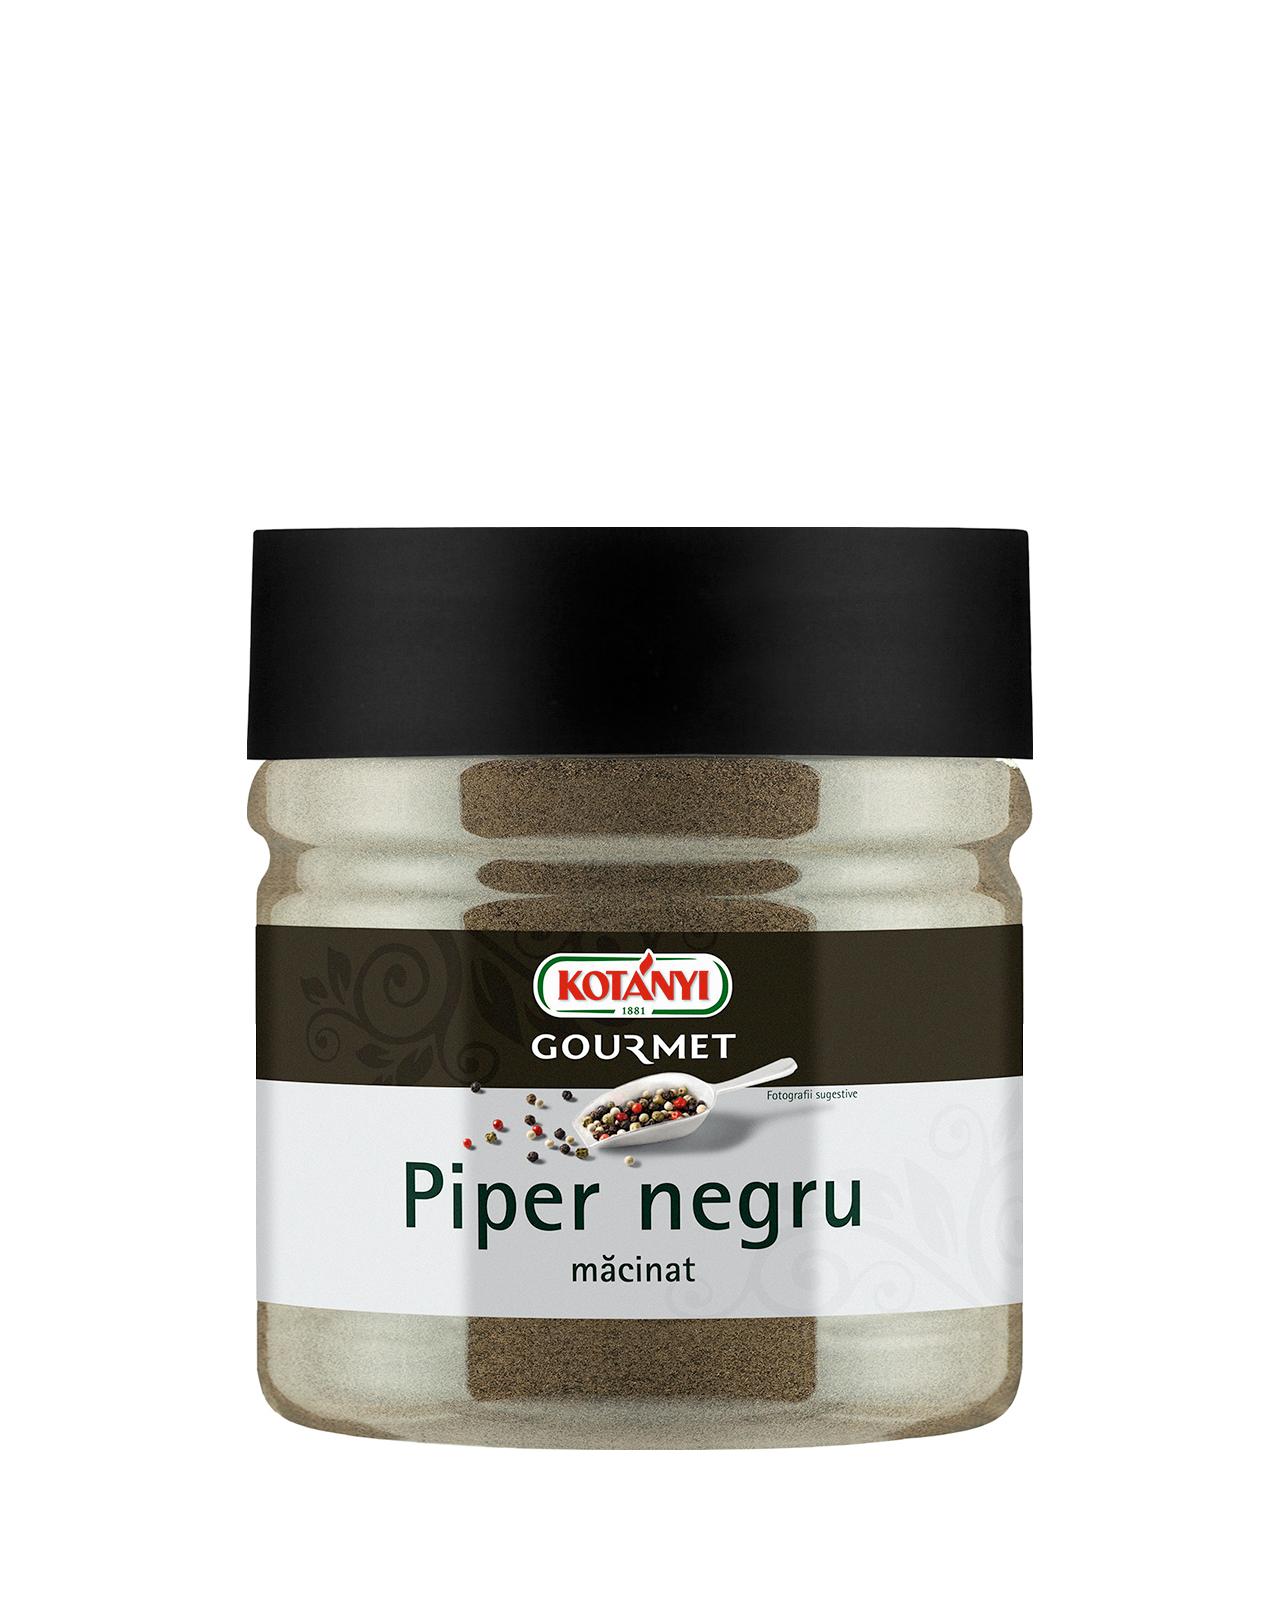 735609 Kotanyi Piper Negru Macinat B2b 400 Tin